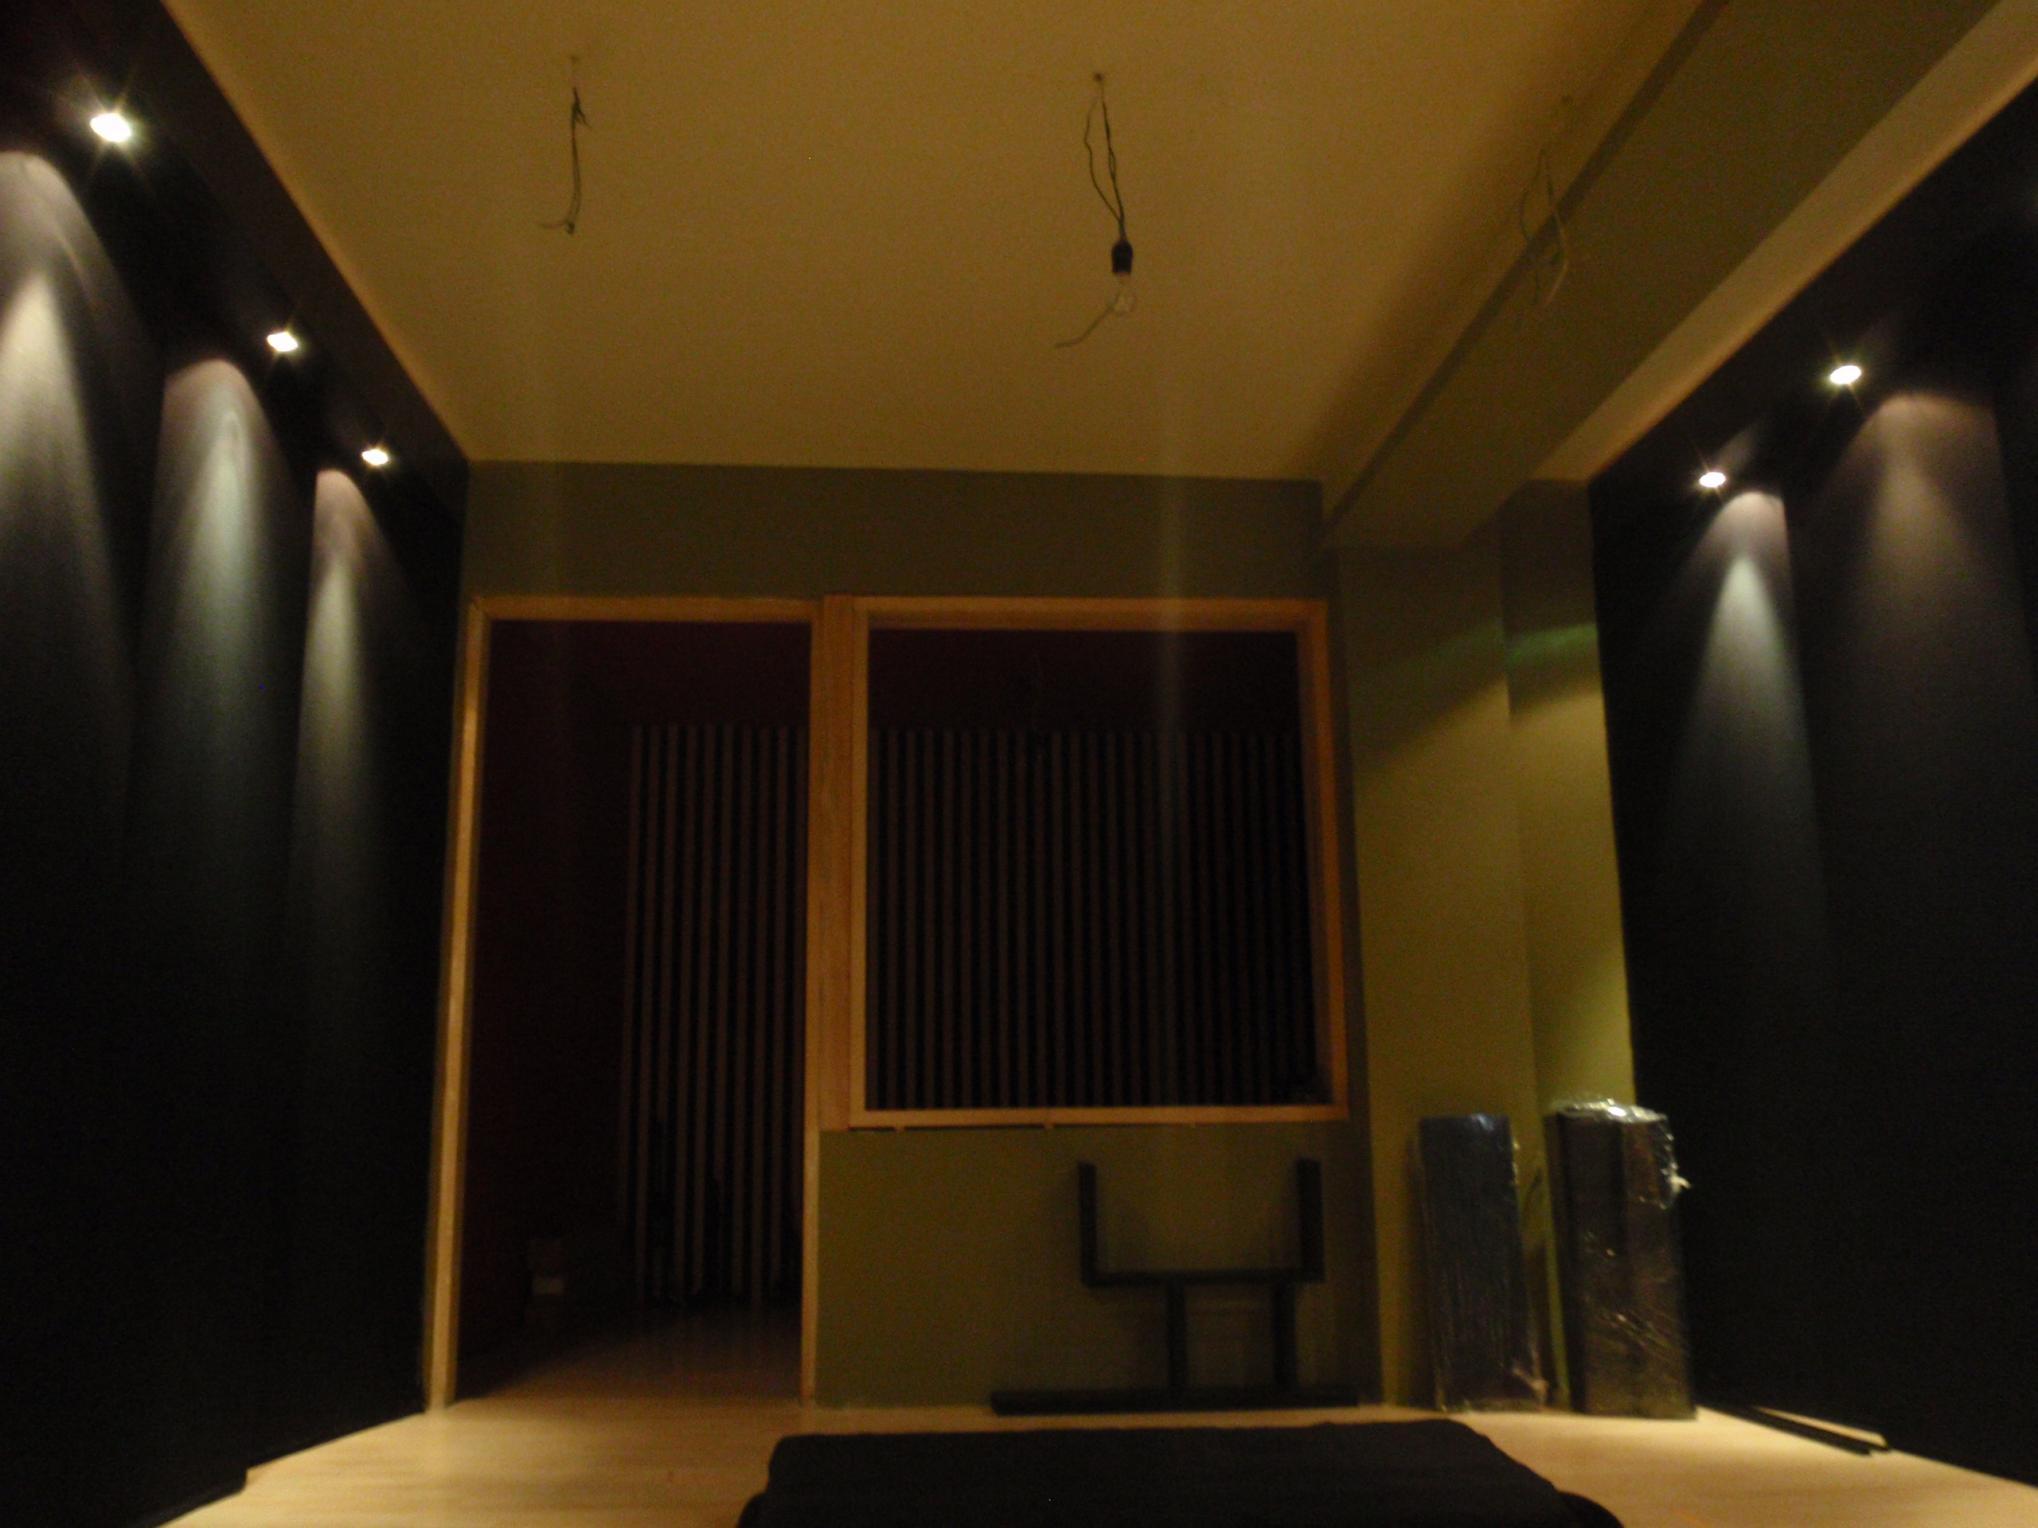 Construindo meu Home Studio - Parte 2 131417d1249873313-final-layout-my-small-studio-lights-4